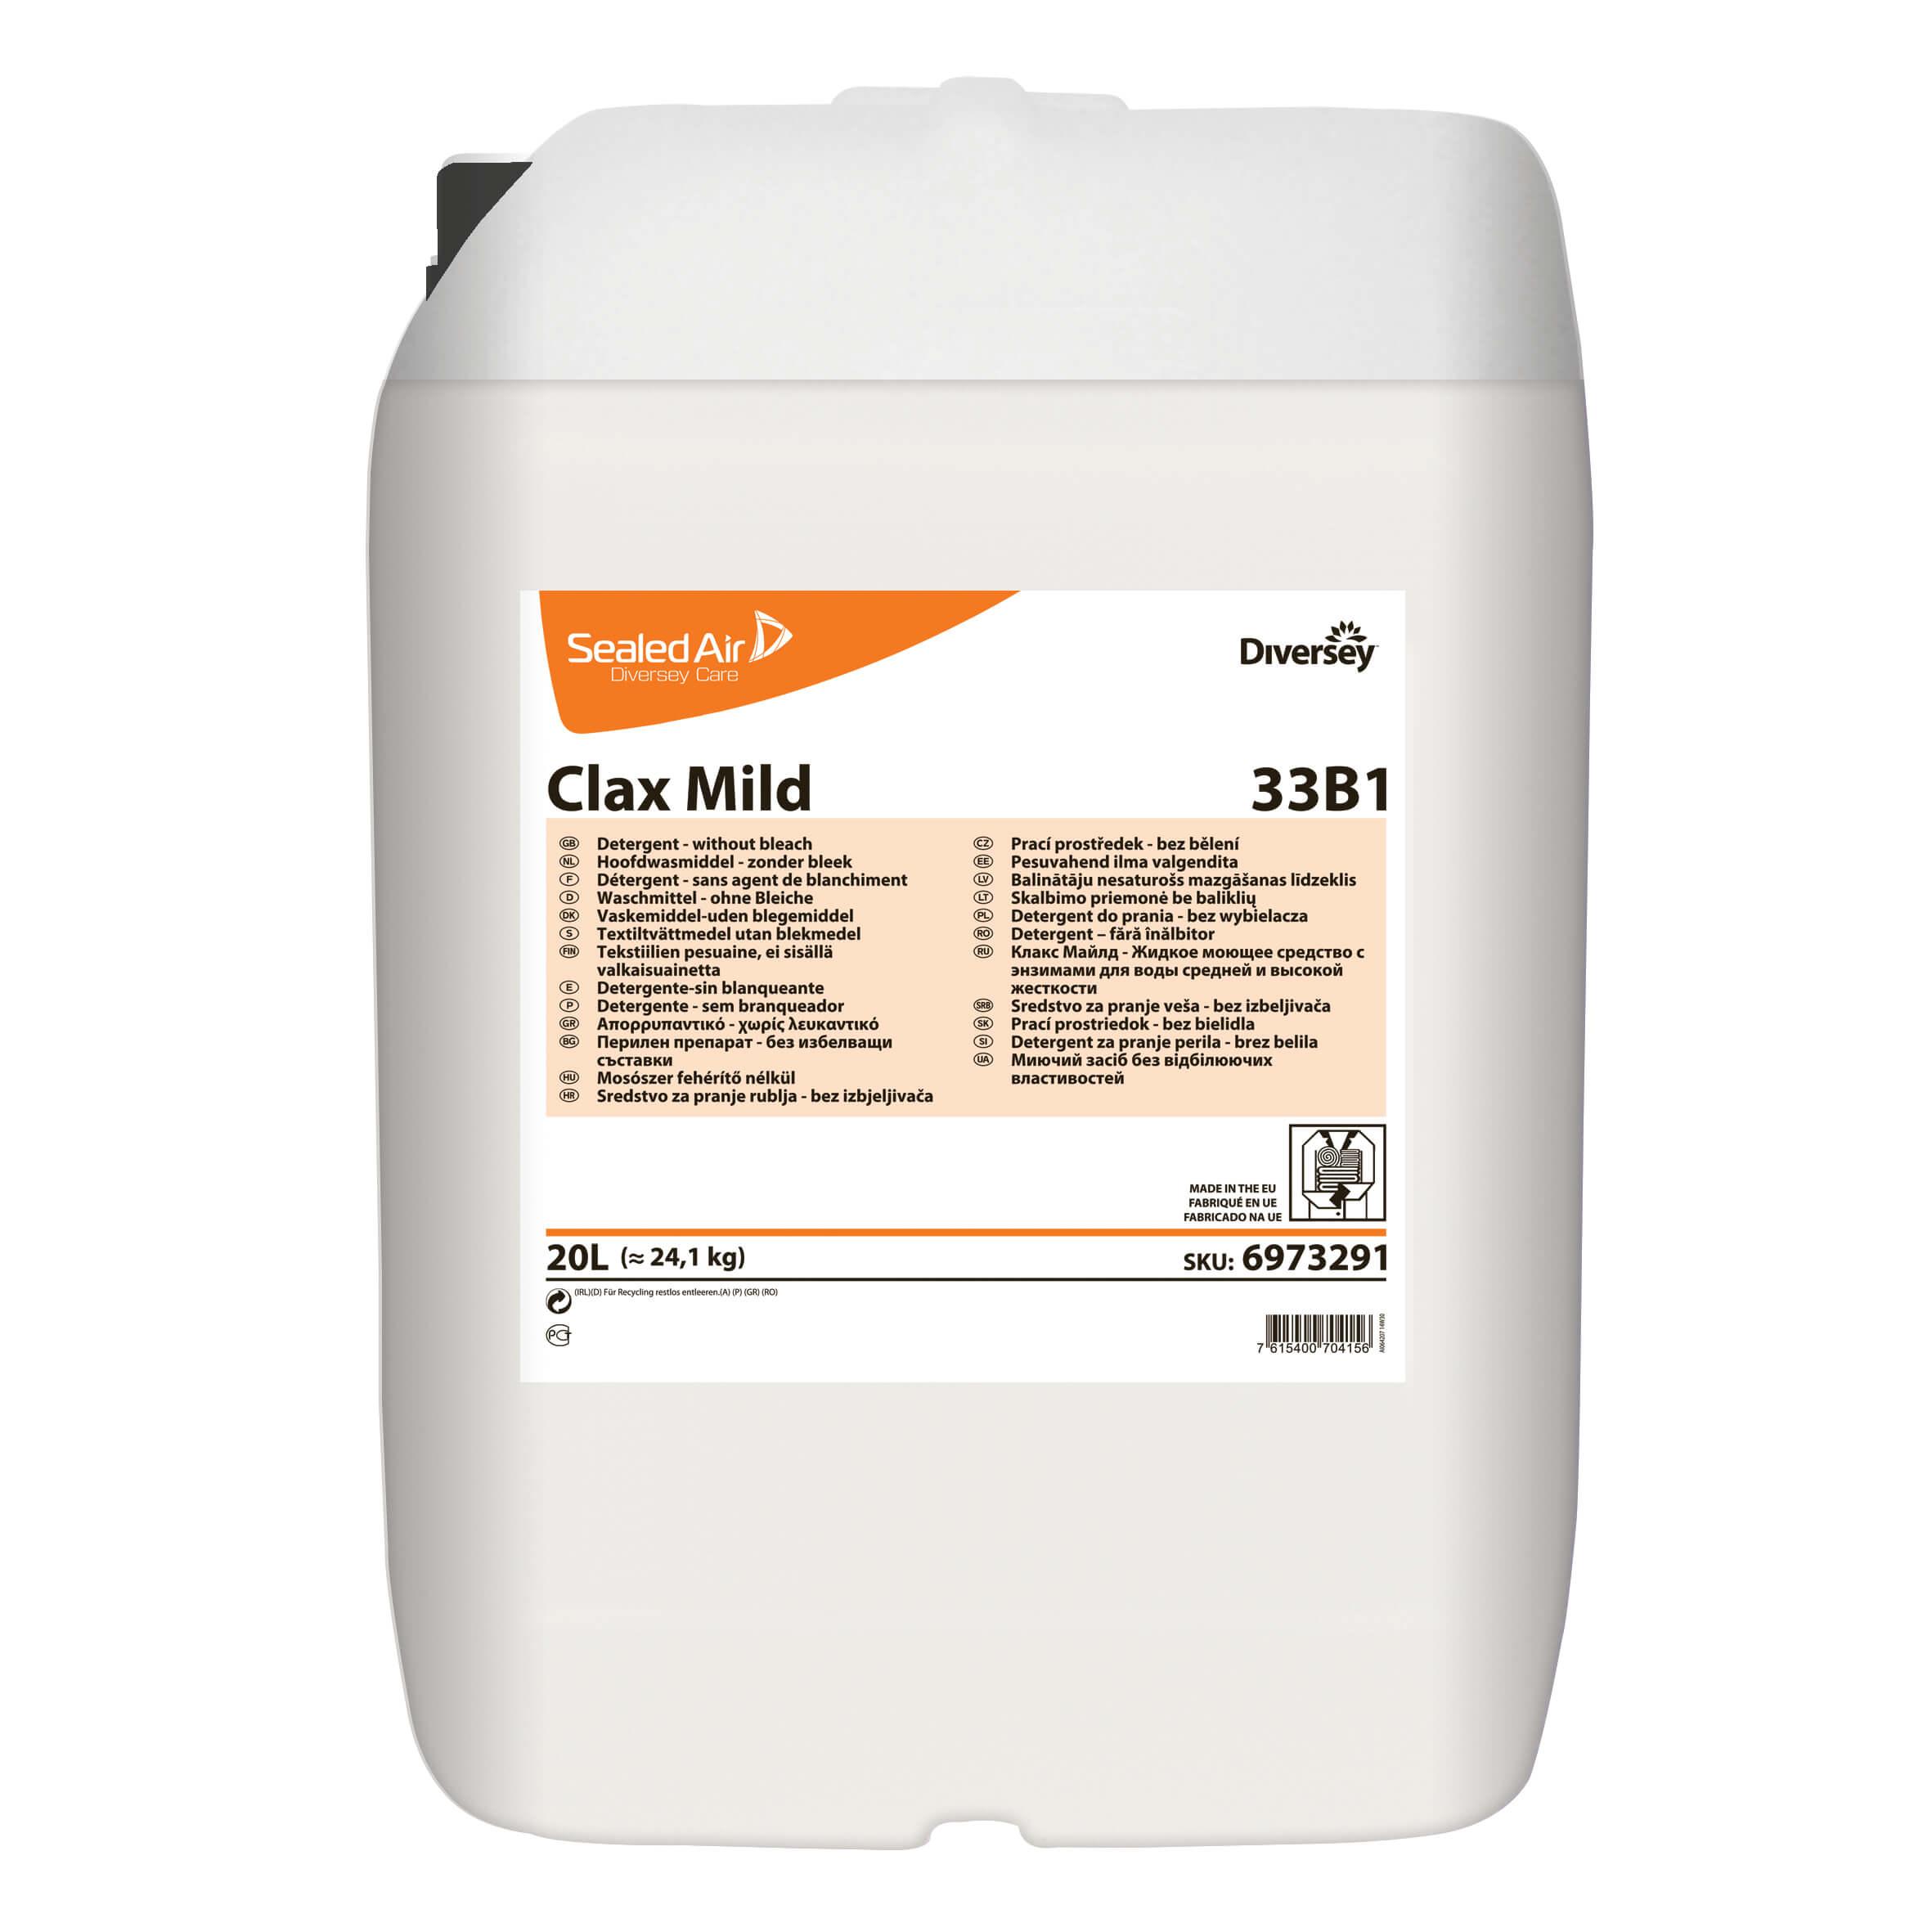 Clax Mild 33B1